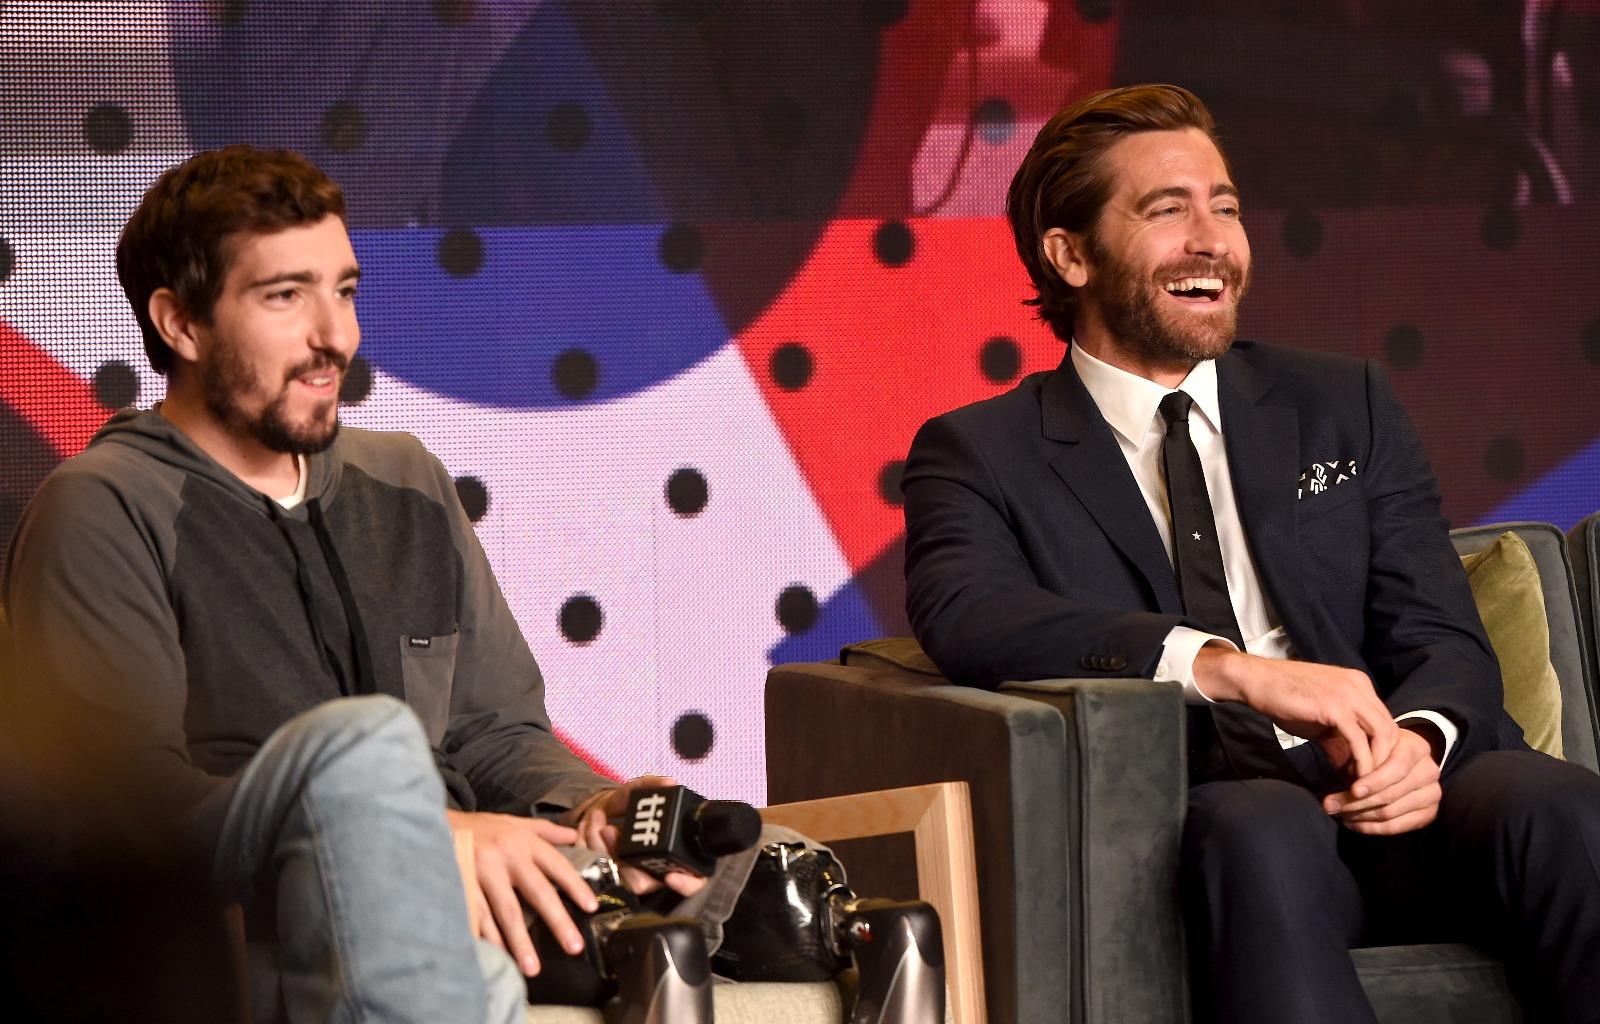 Jake Gyllenhaal Stronger Press Conference